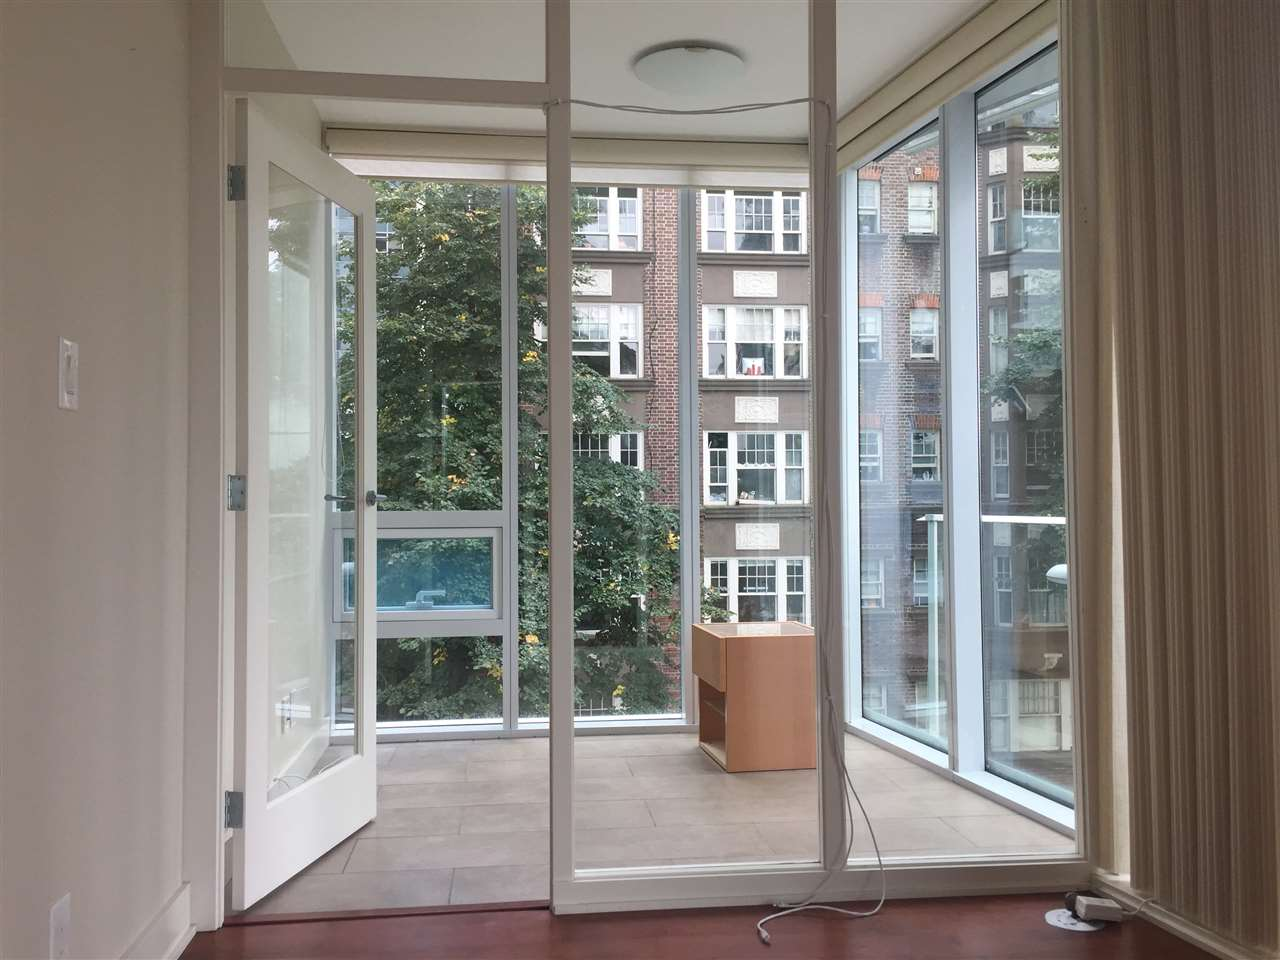 Condo Apartment at 301 1277 MELVILLE STREET, Unit 301, Vancouver West, British Columbia. Image 4